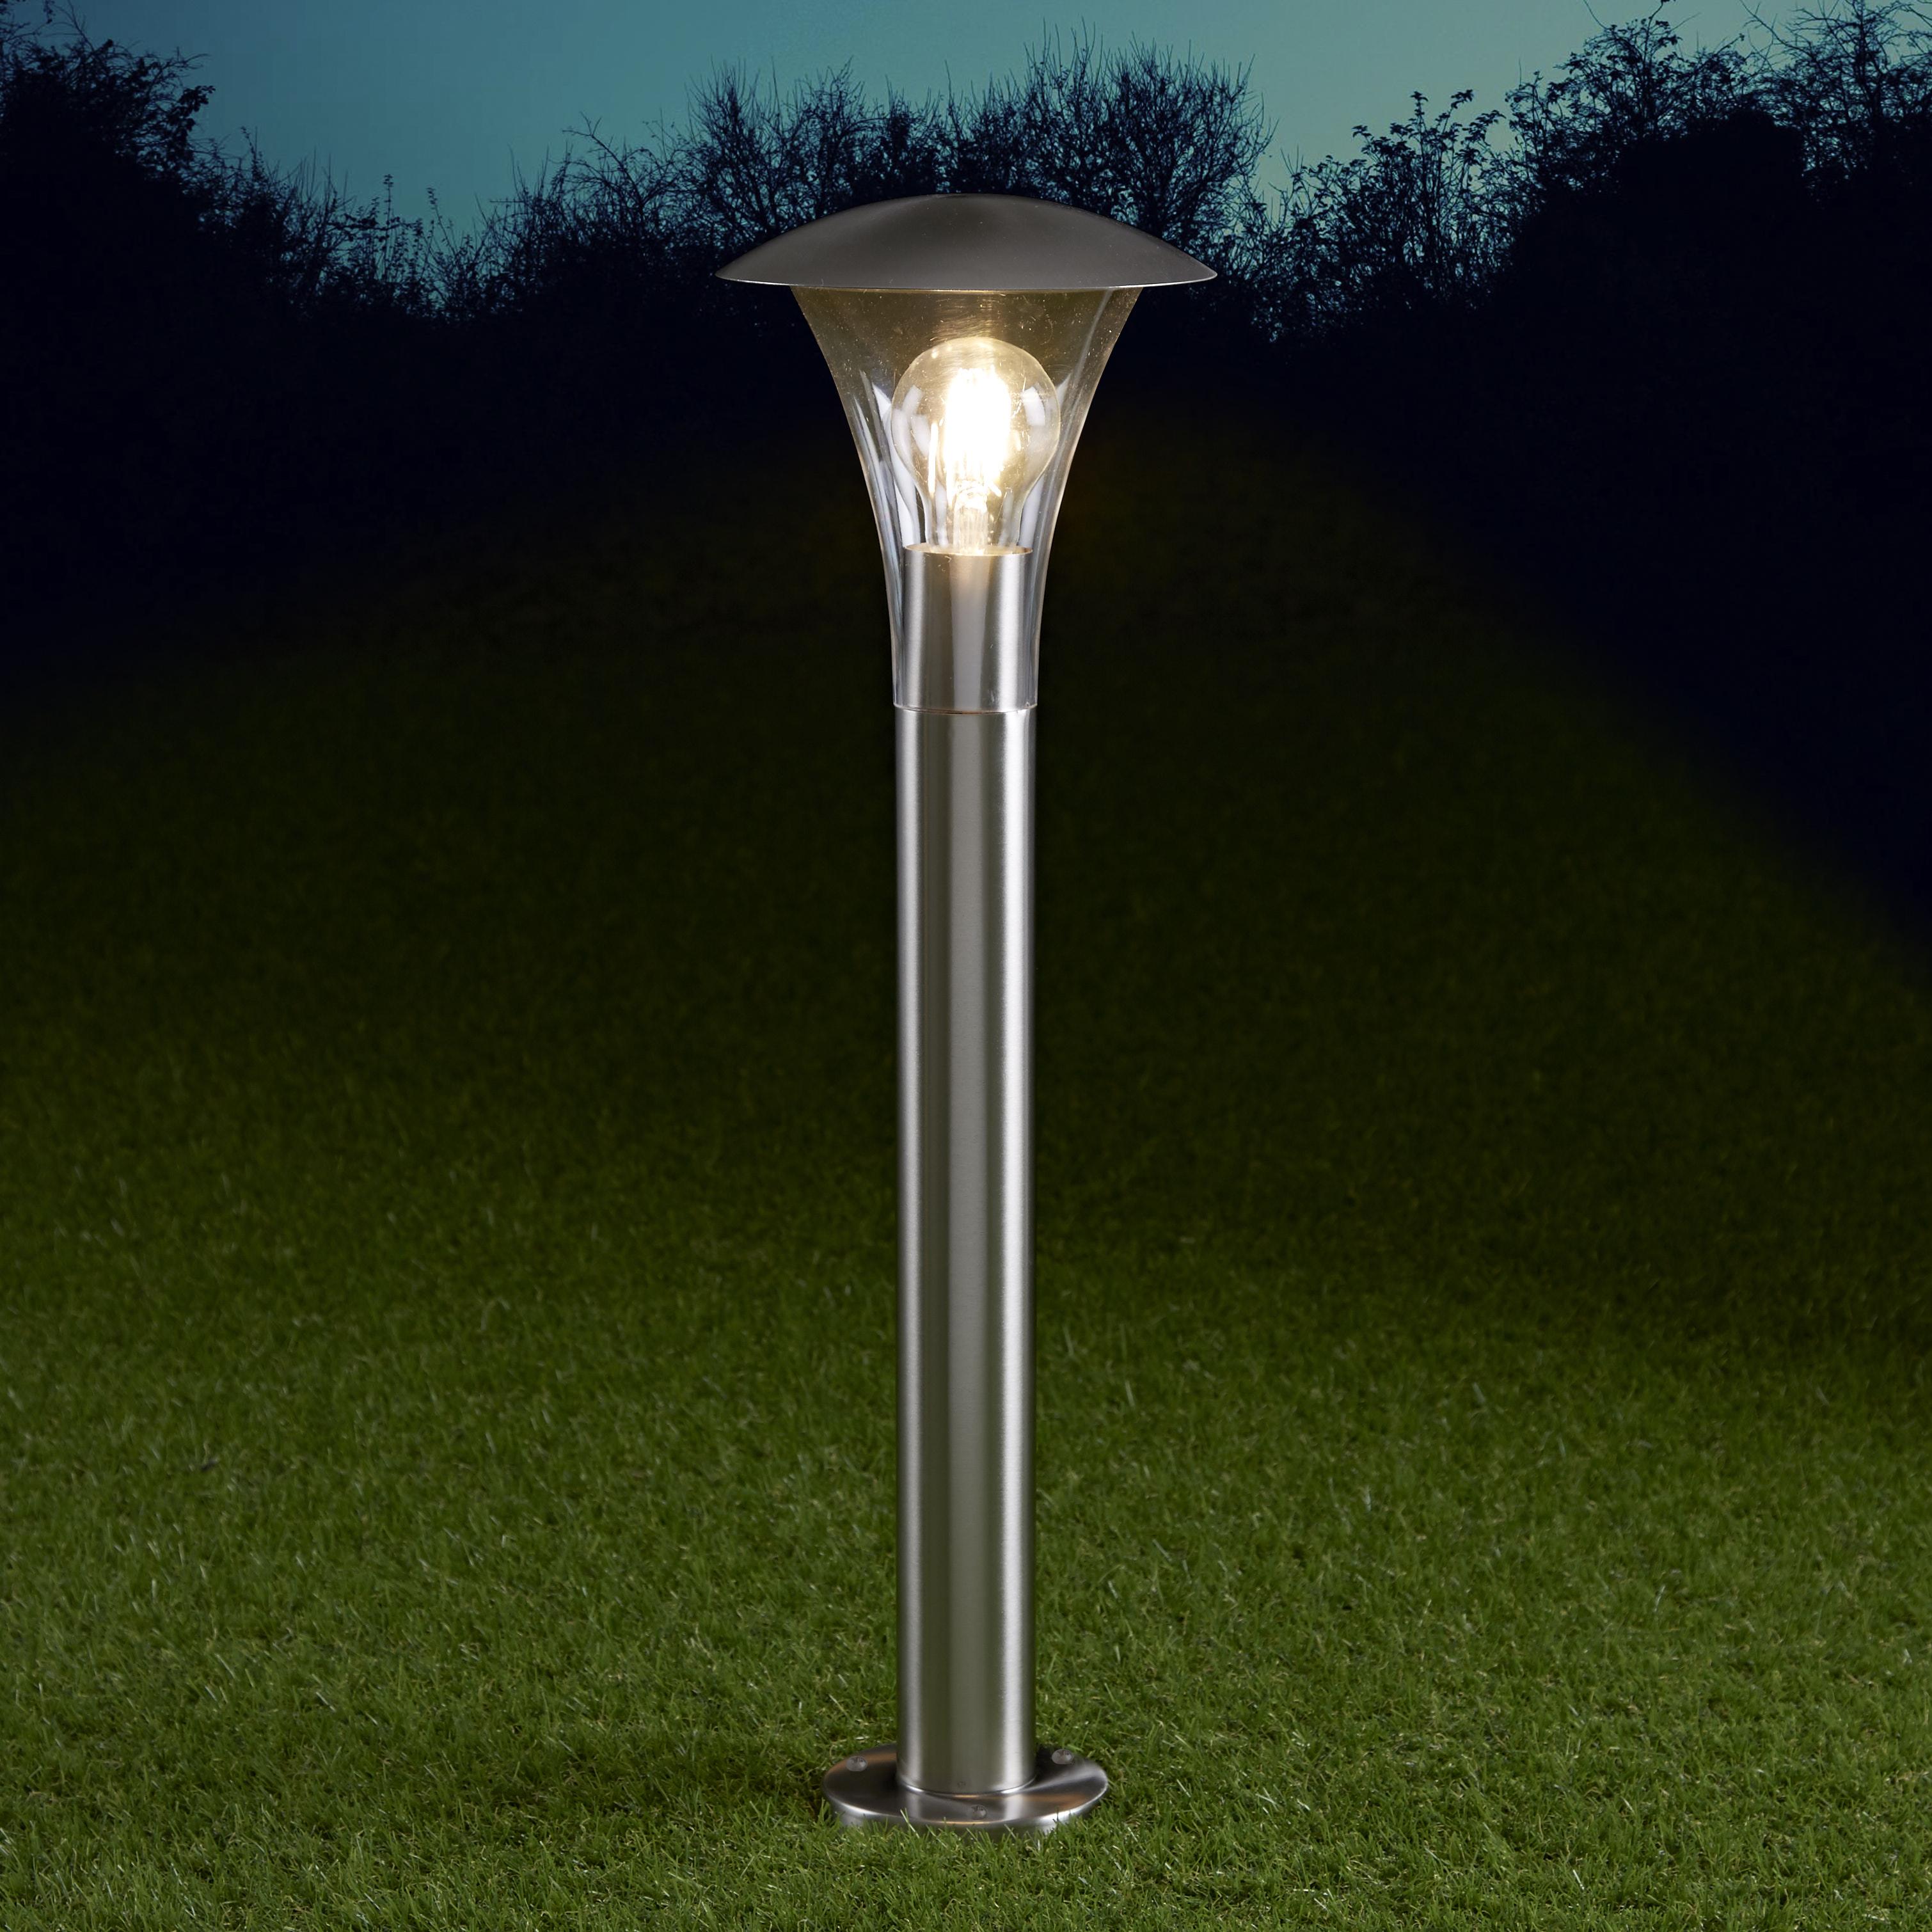 Biard Cholet 600mm Pollerleuchte Edelstahl Chrom inklusive Leuchtmittel